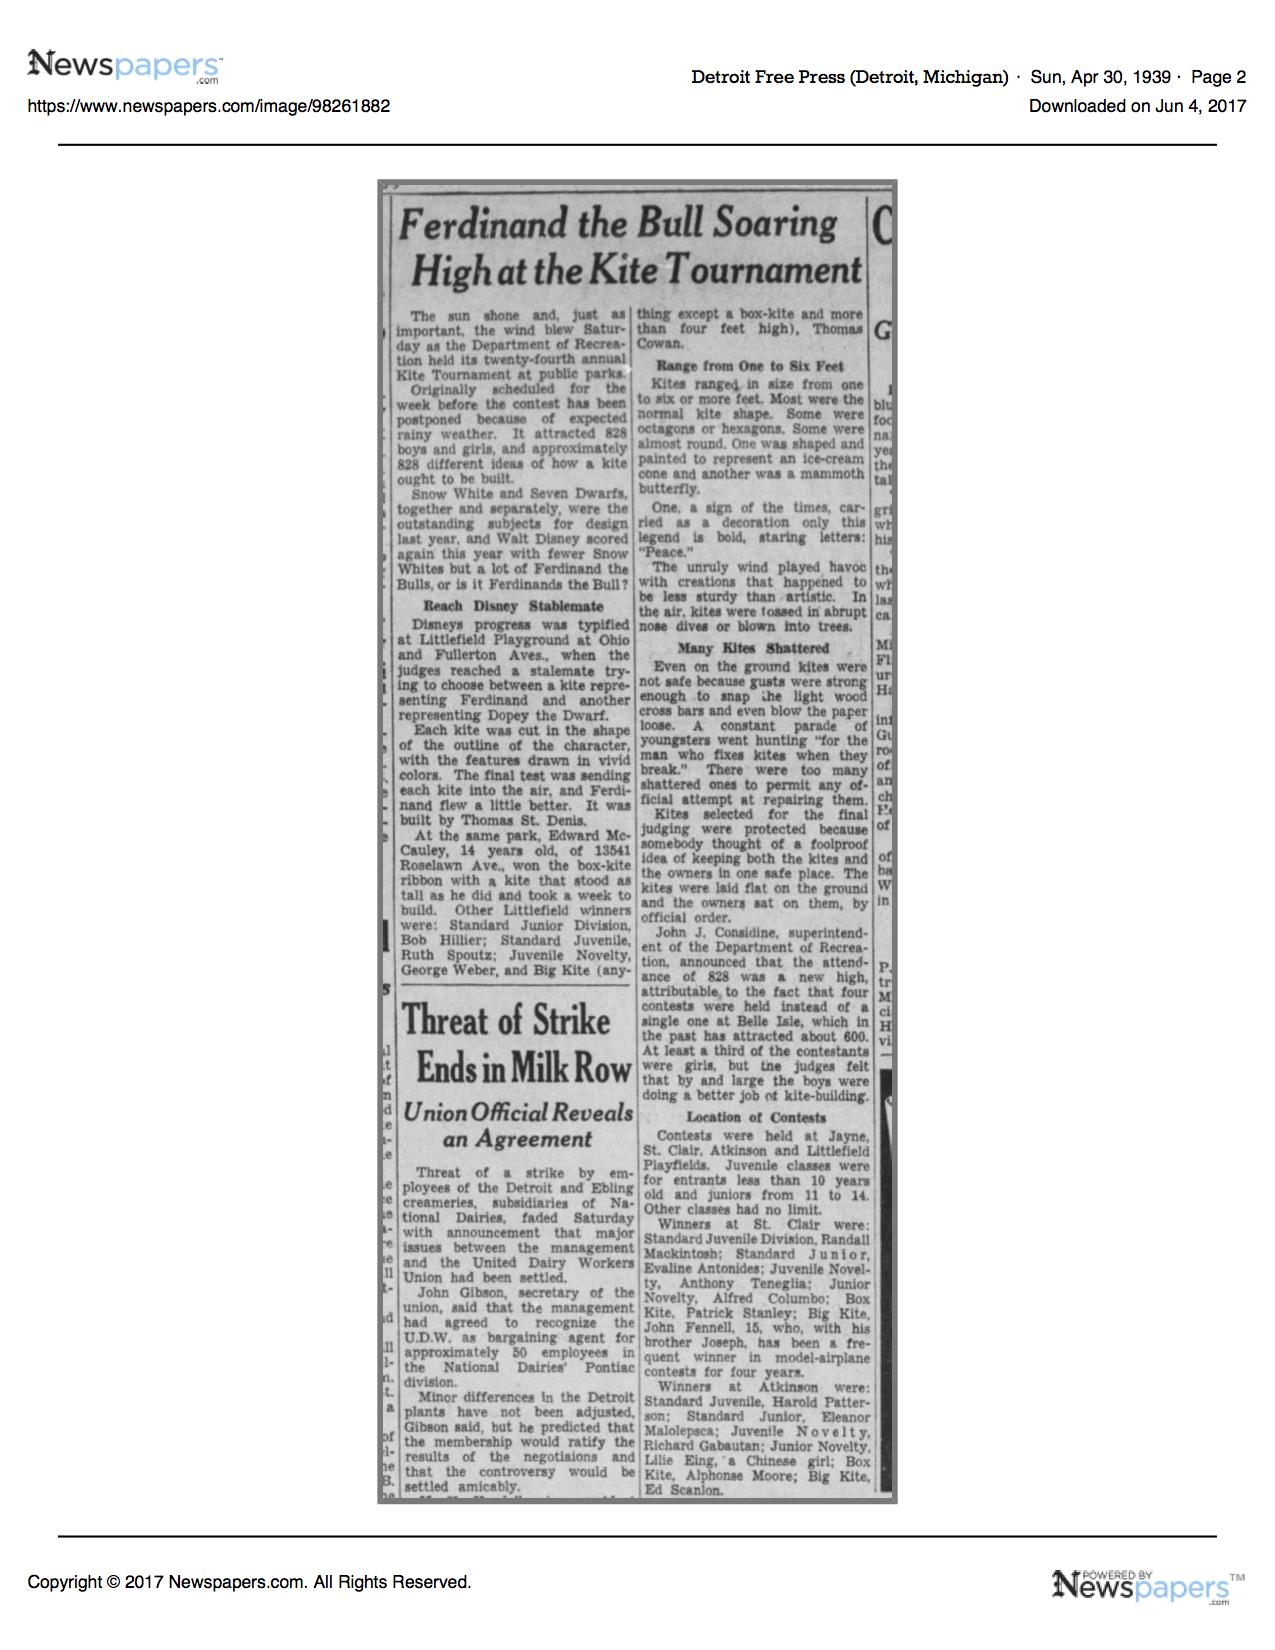 Detroit_Free_Press_Sun__Apr_30__1939_.jpg